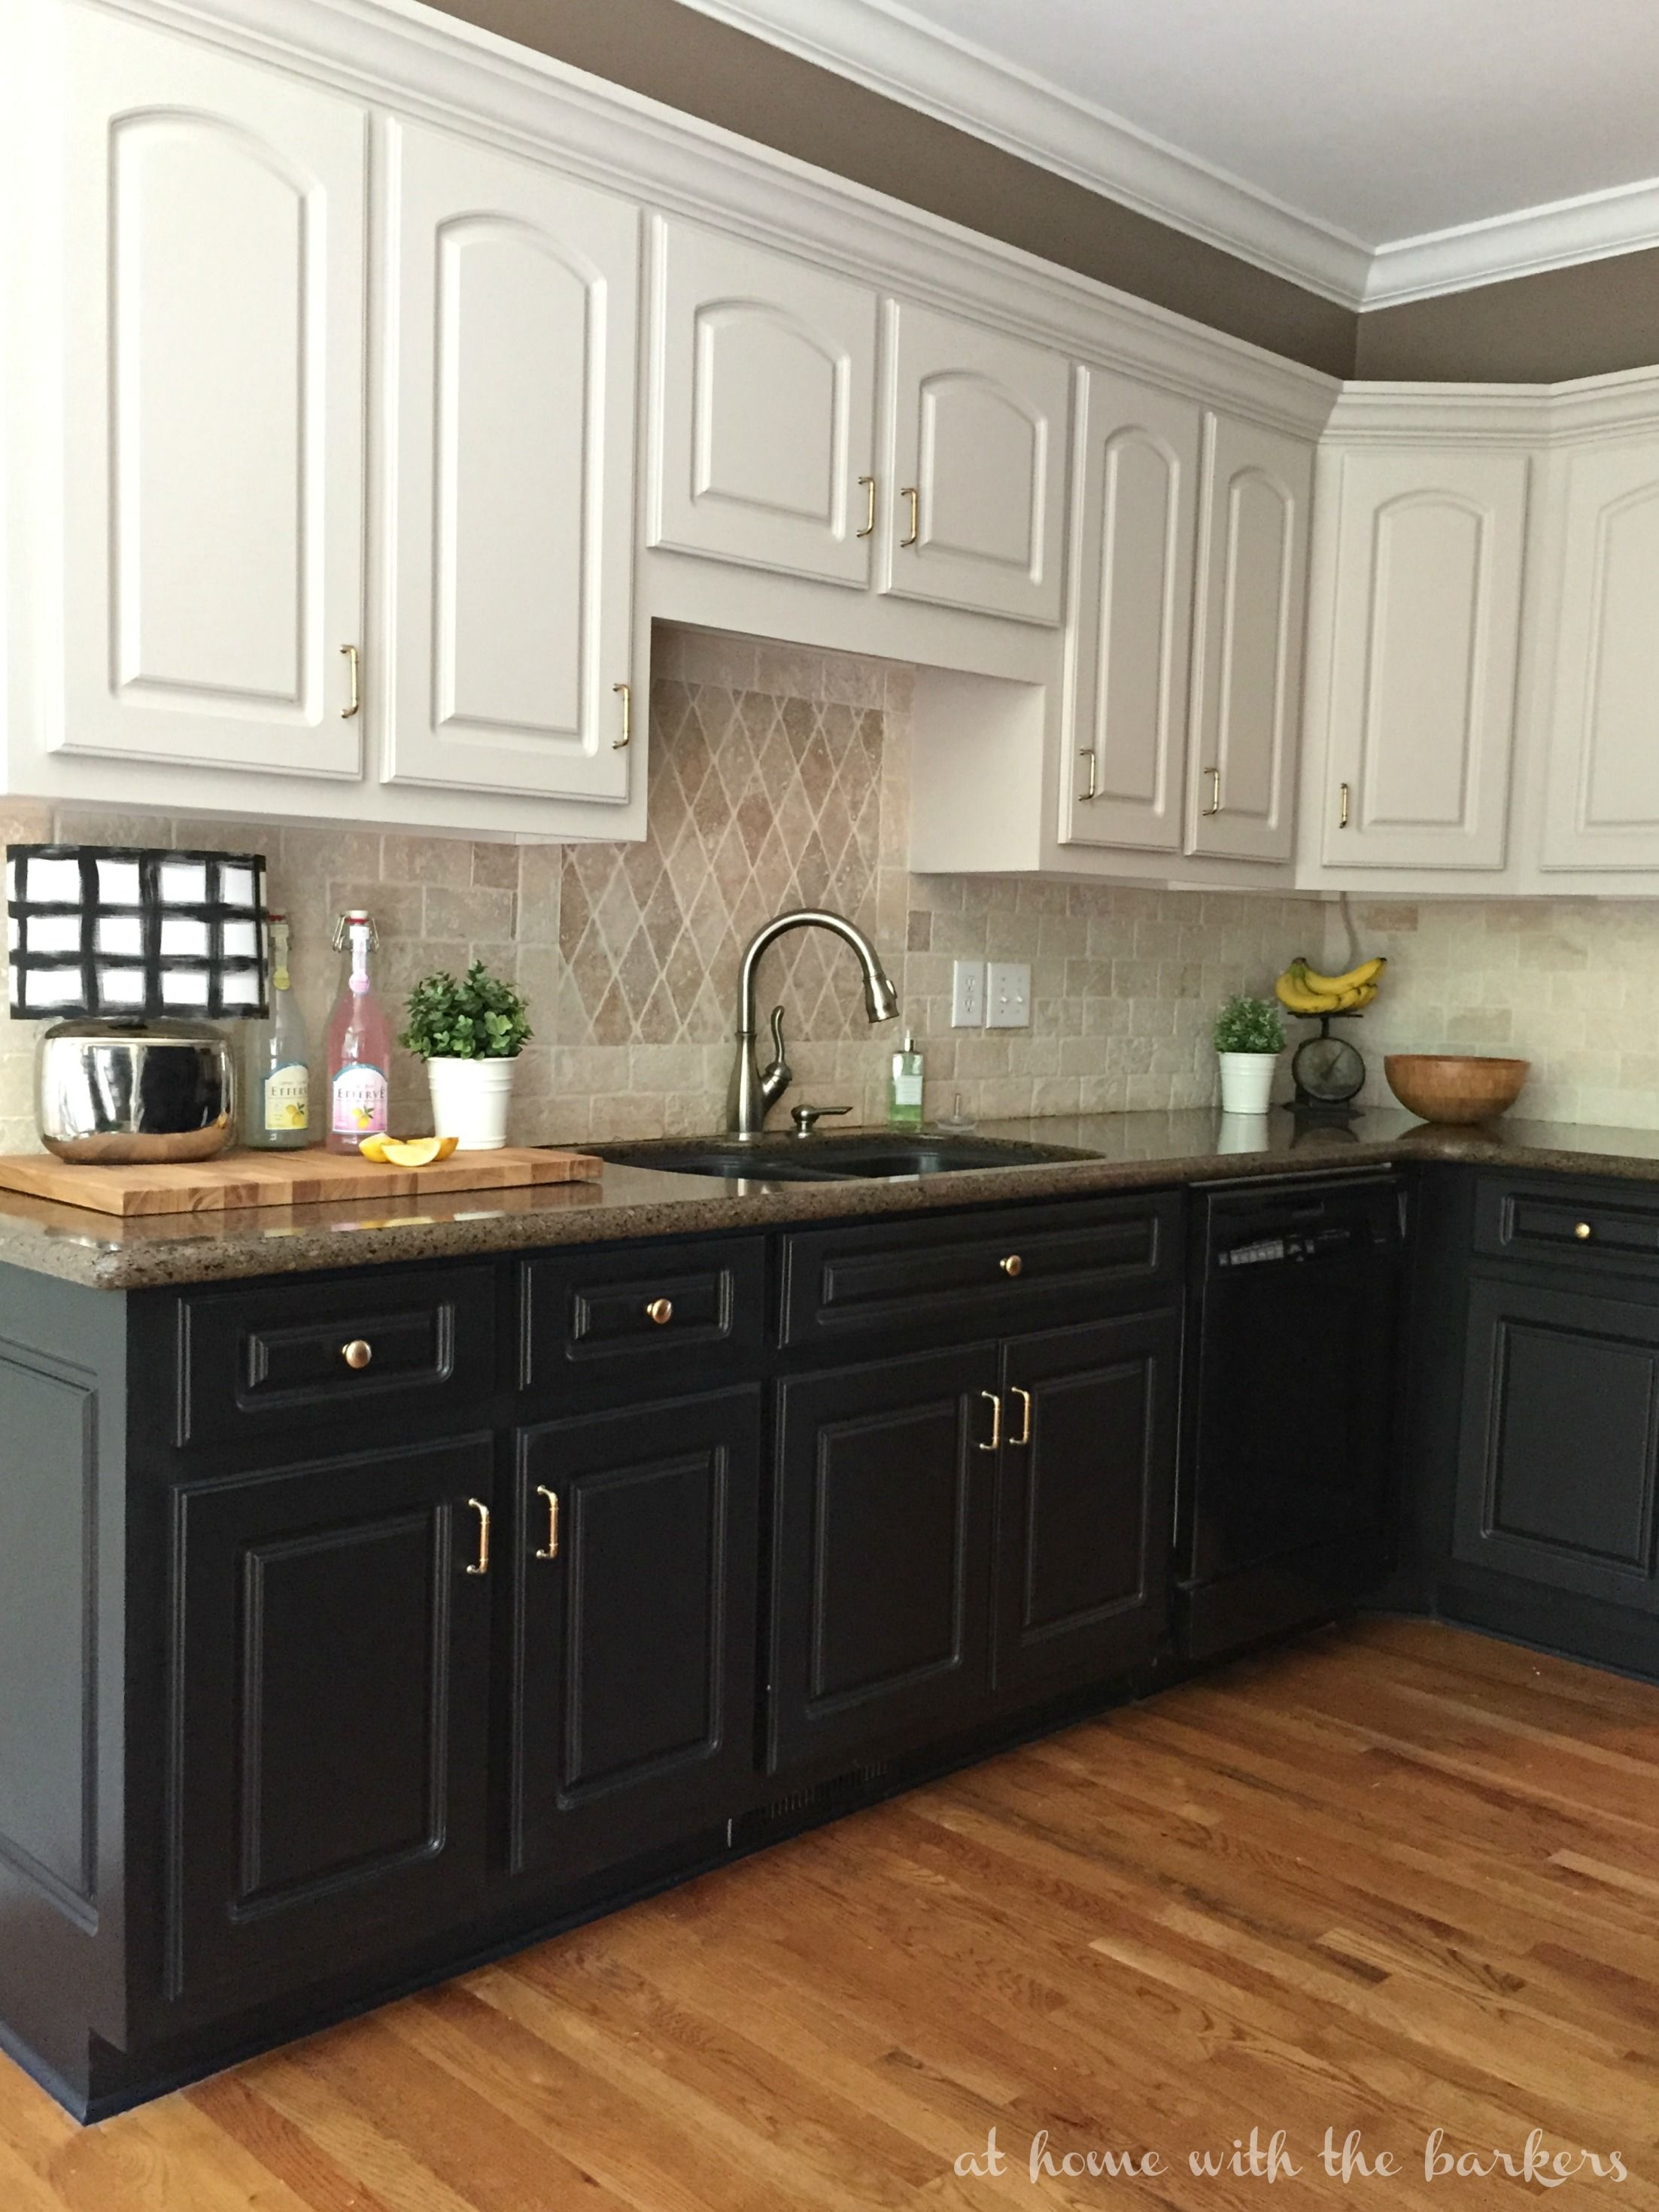 Follow Your Gut when Decorating Black kitchen